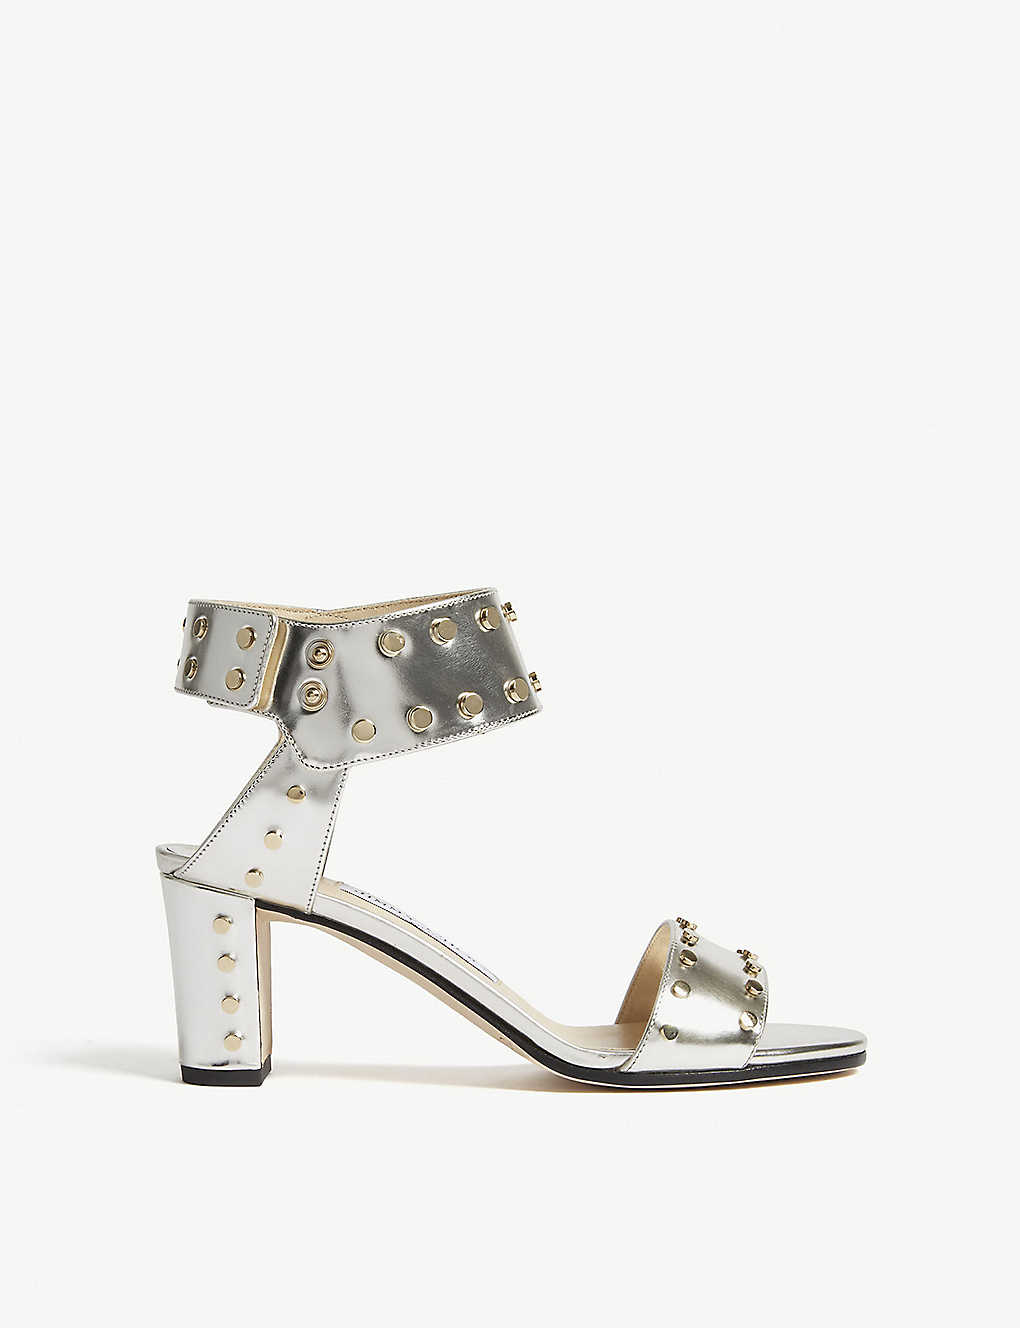 c7eb8ce9b861 JIMMY CHOO - Veto 65 mirror leather heeled sandals